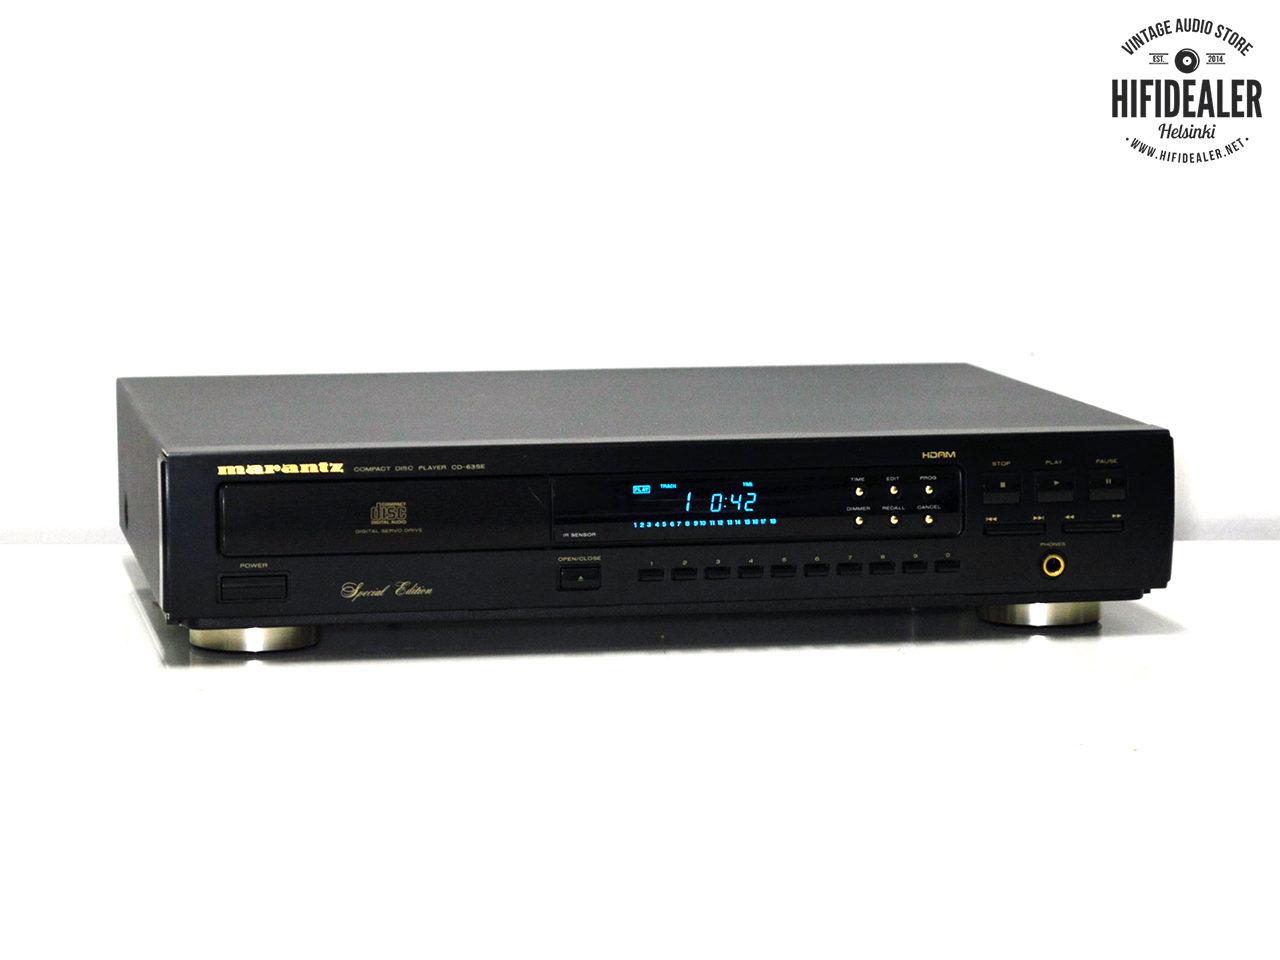 marantz-cd-63se